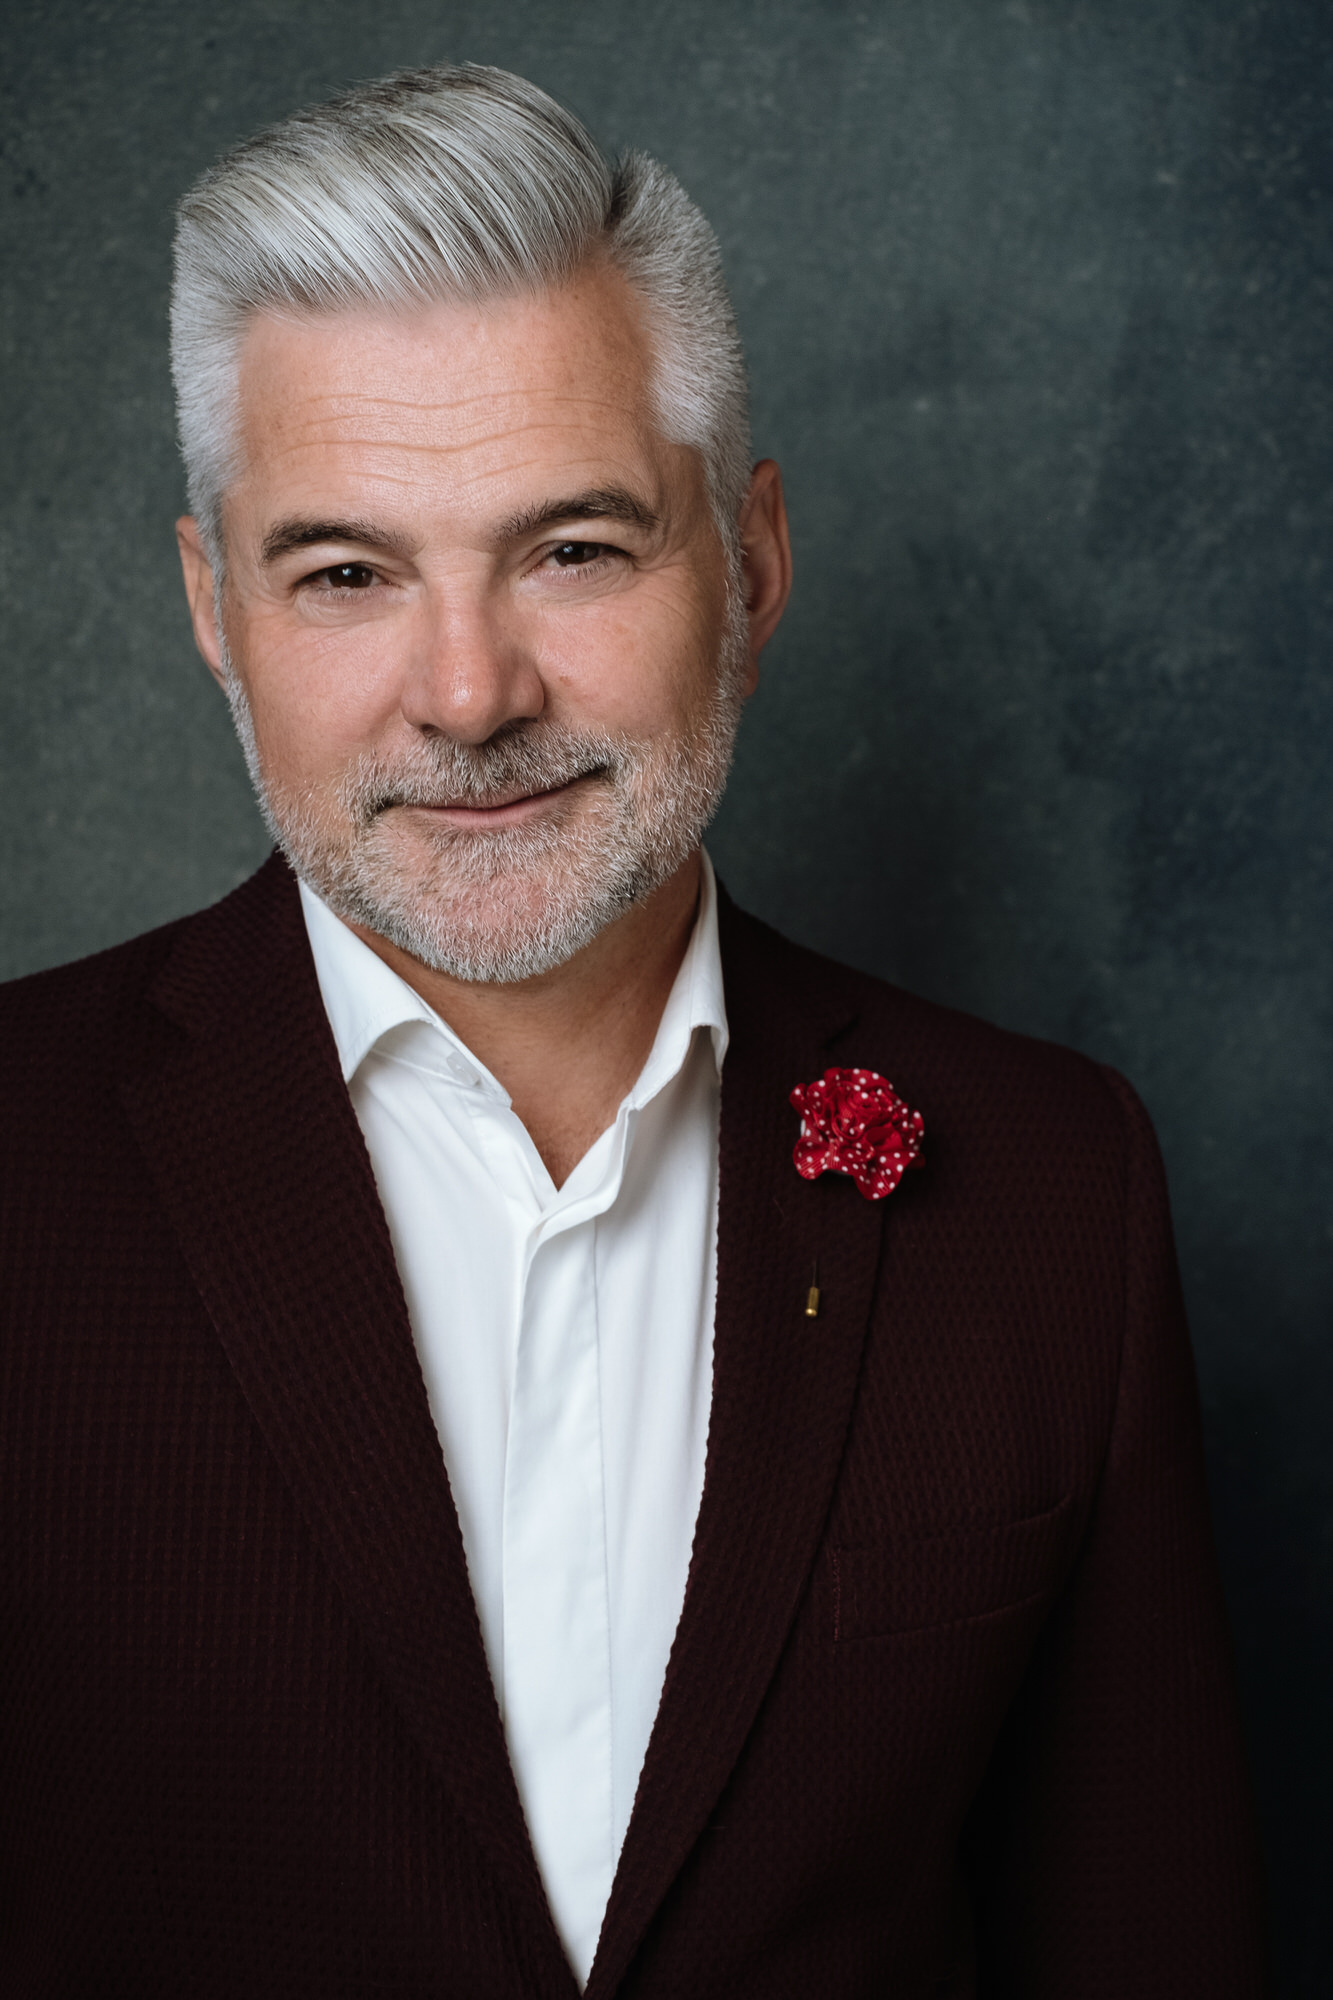 MarkBellamy- -Ryan-Parker-Photography-Edmonton-Headshots-Alberta-Headshot-Portrait-Photographer-Corporate-Actor-Business-Professional-Acting-Studio-Calgary.jpg